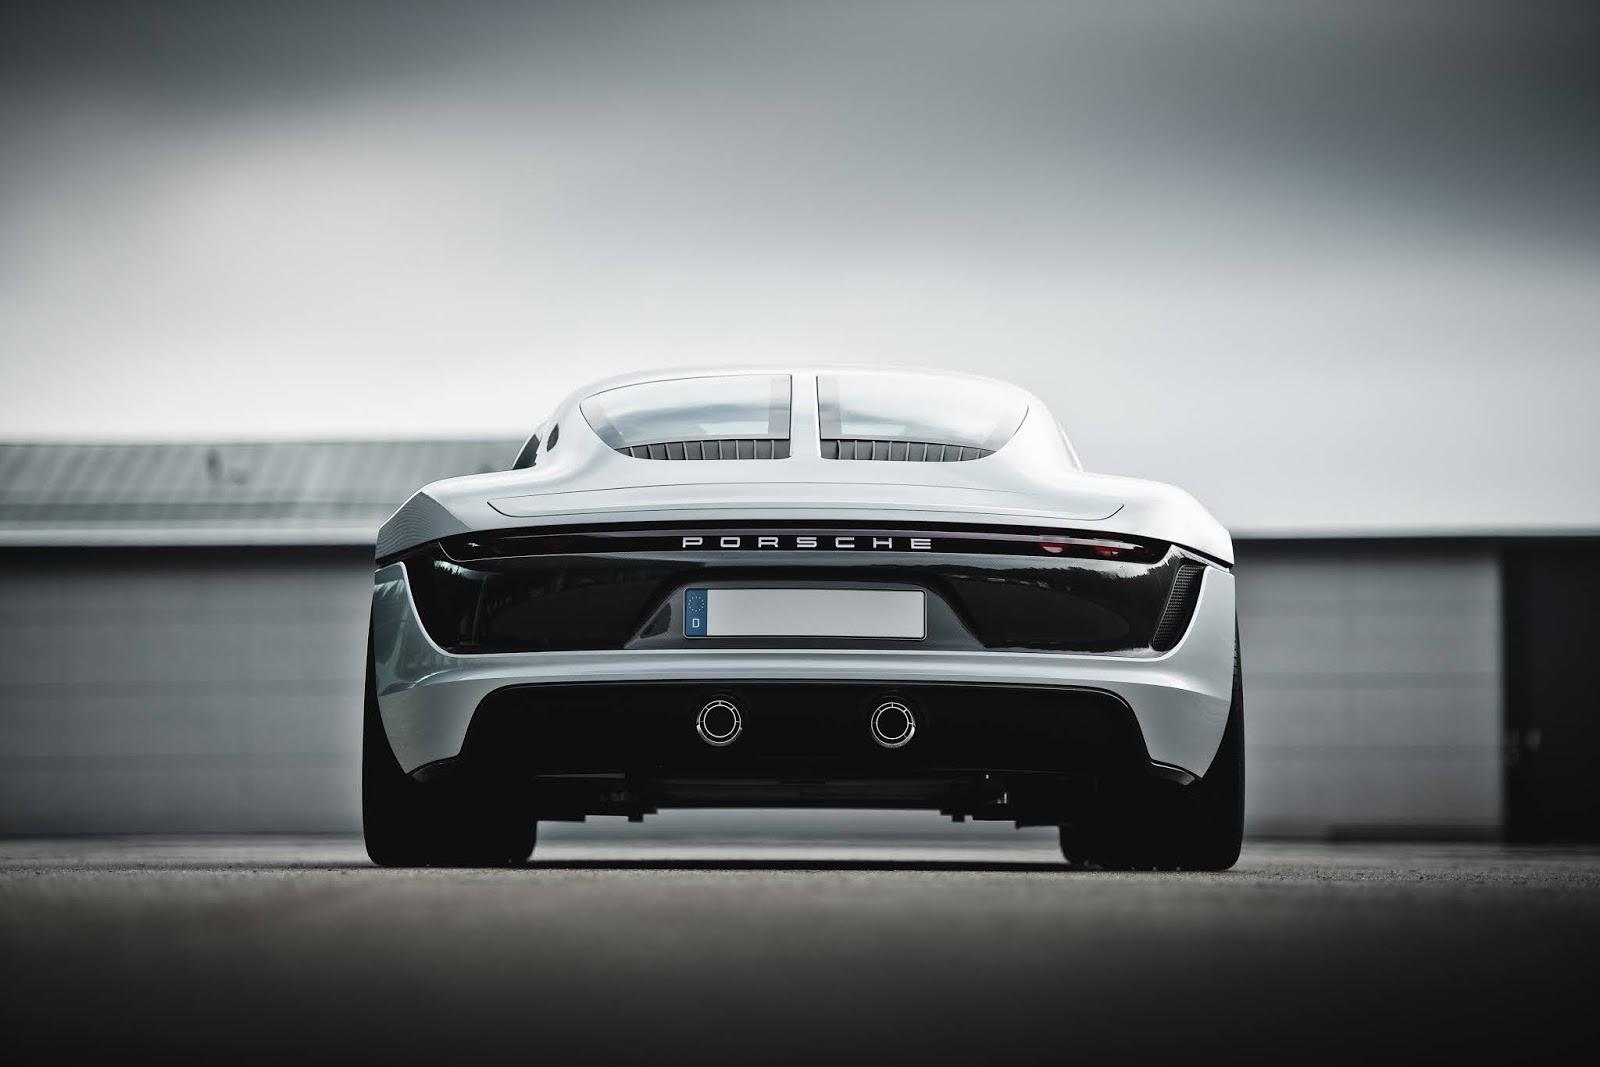 CVS0717 Le Mans Living Legend : Το πρωτότυπο που γέννησε την 718 Cayman GT4 LE MANS, Porsche, Porsche Le Mans, Porsche Unseen, sportscar, supercar, supercars, zblog, ειδήσεις